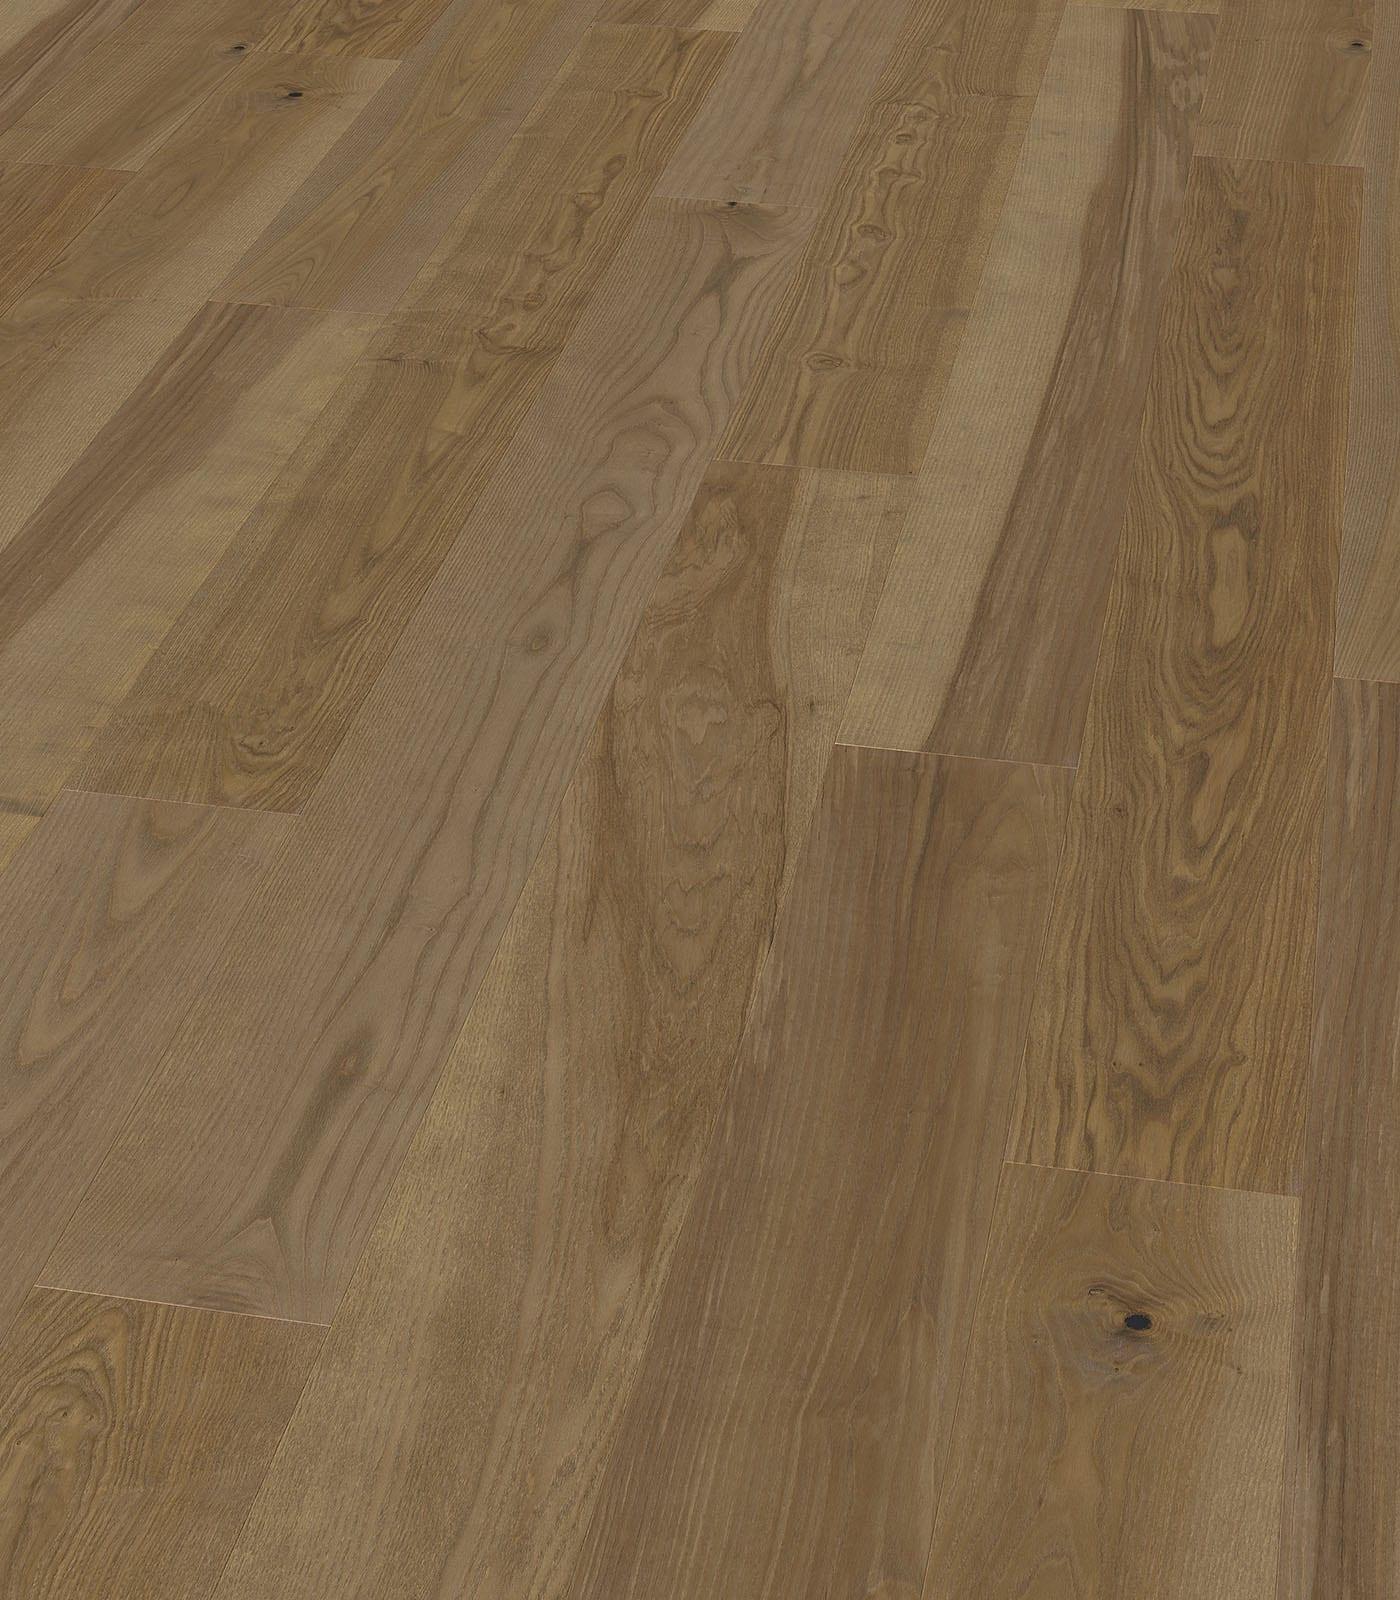 Sofia-European Ash floors-After Oak Collection - angle